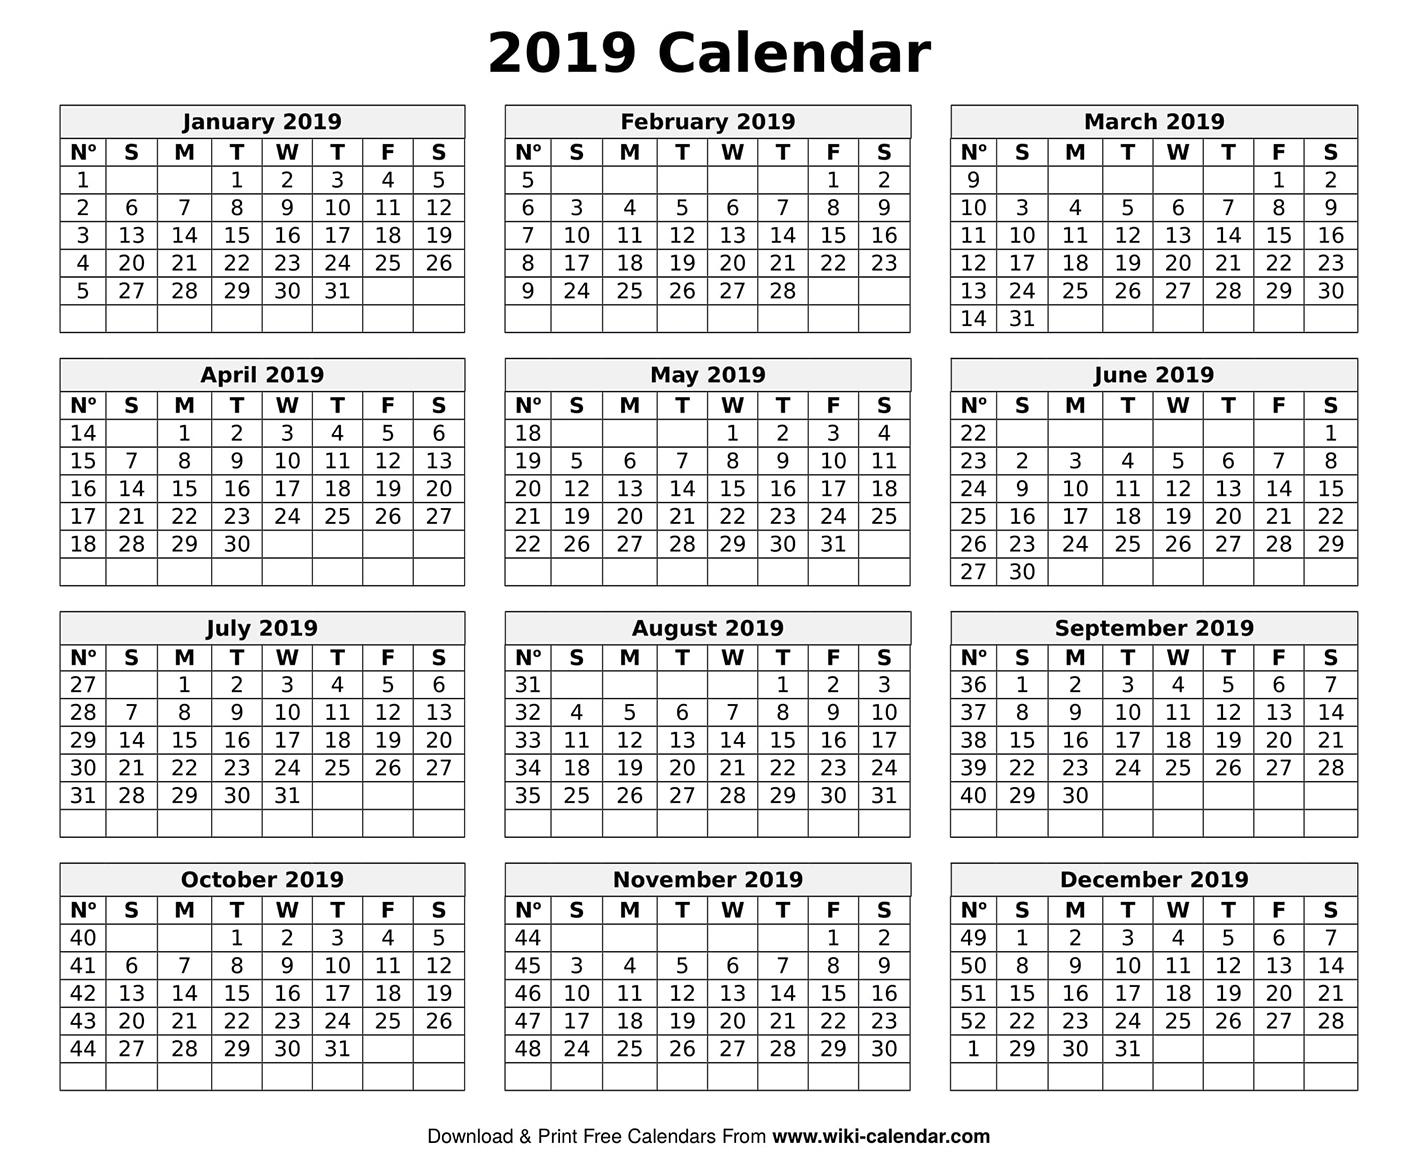 Printable Blank 2019 Calendar Templates for July Through December Blank Calendars